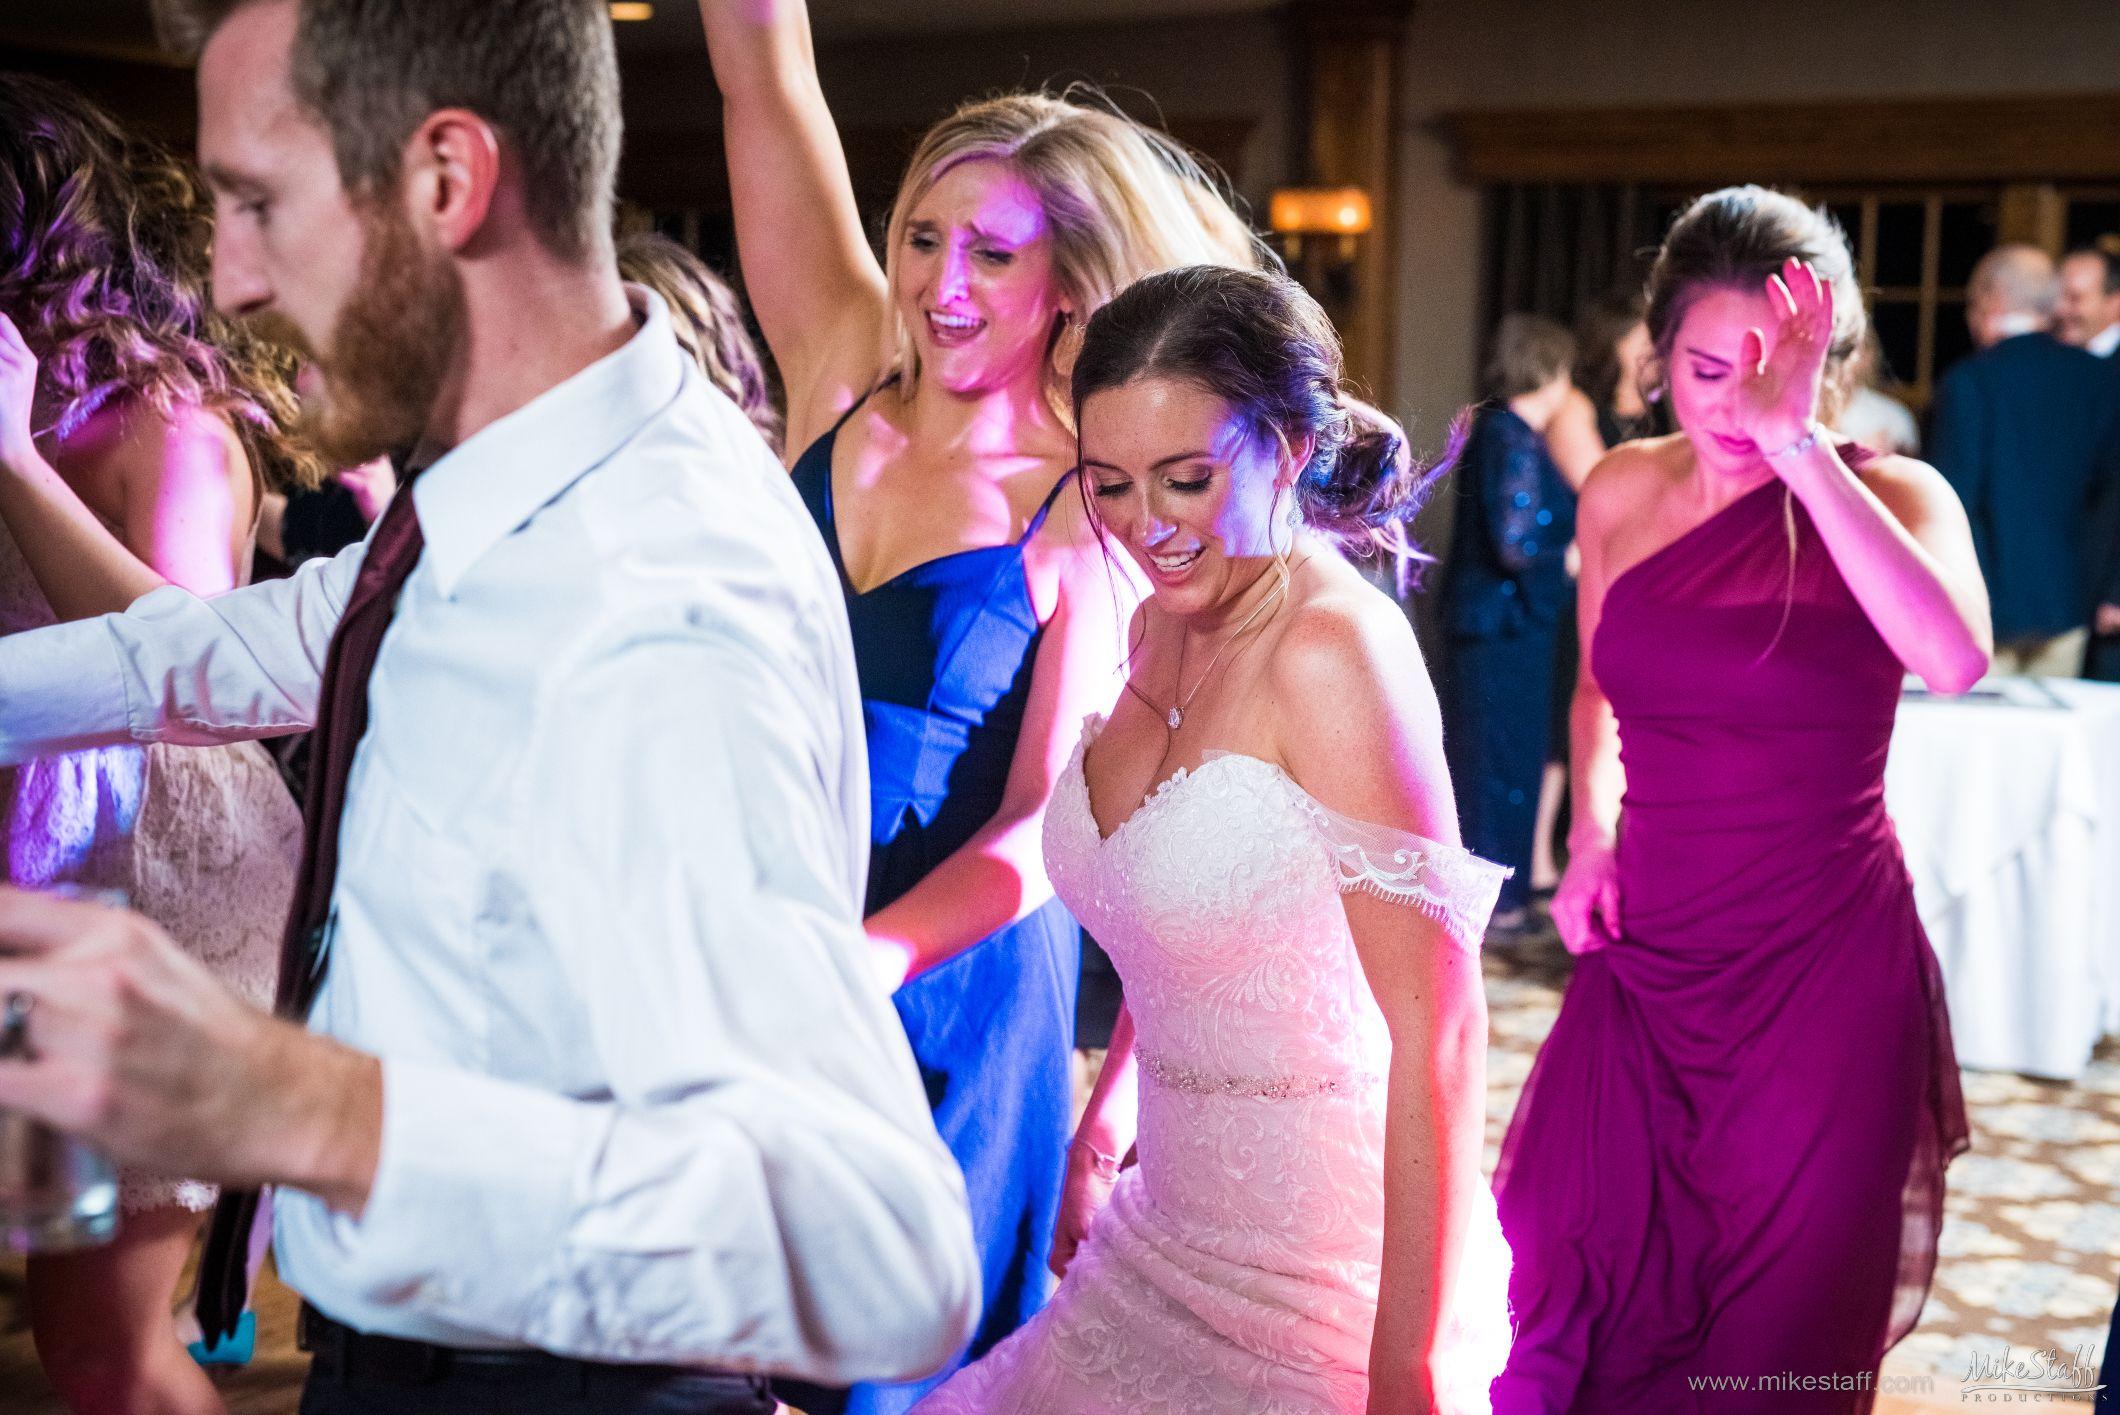 Have You Read How To Hire A Great Dj Wedding Dj Wedding Congratulations Wedding